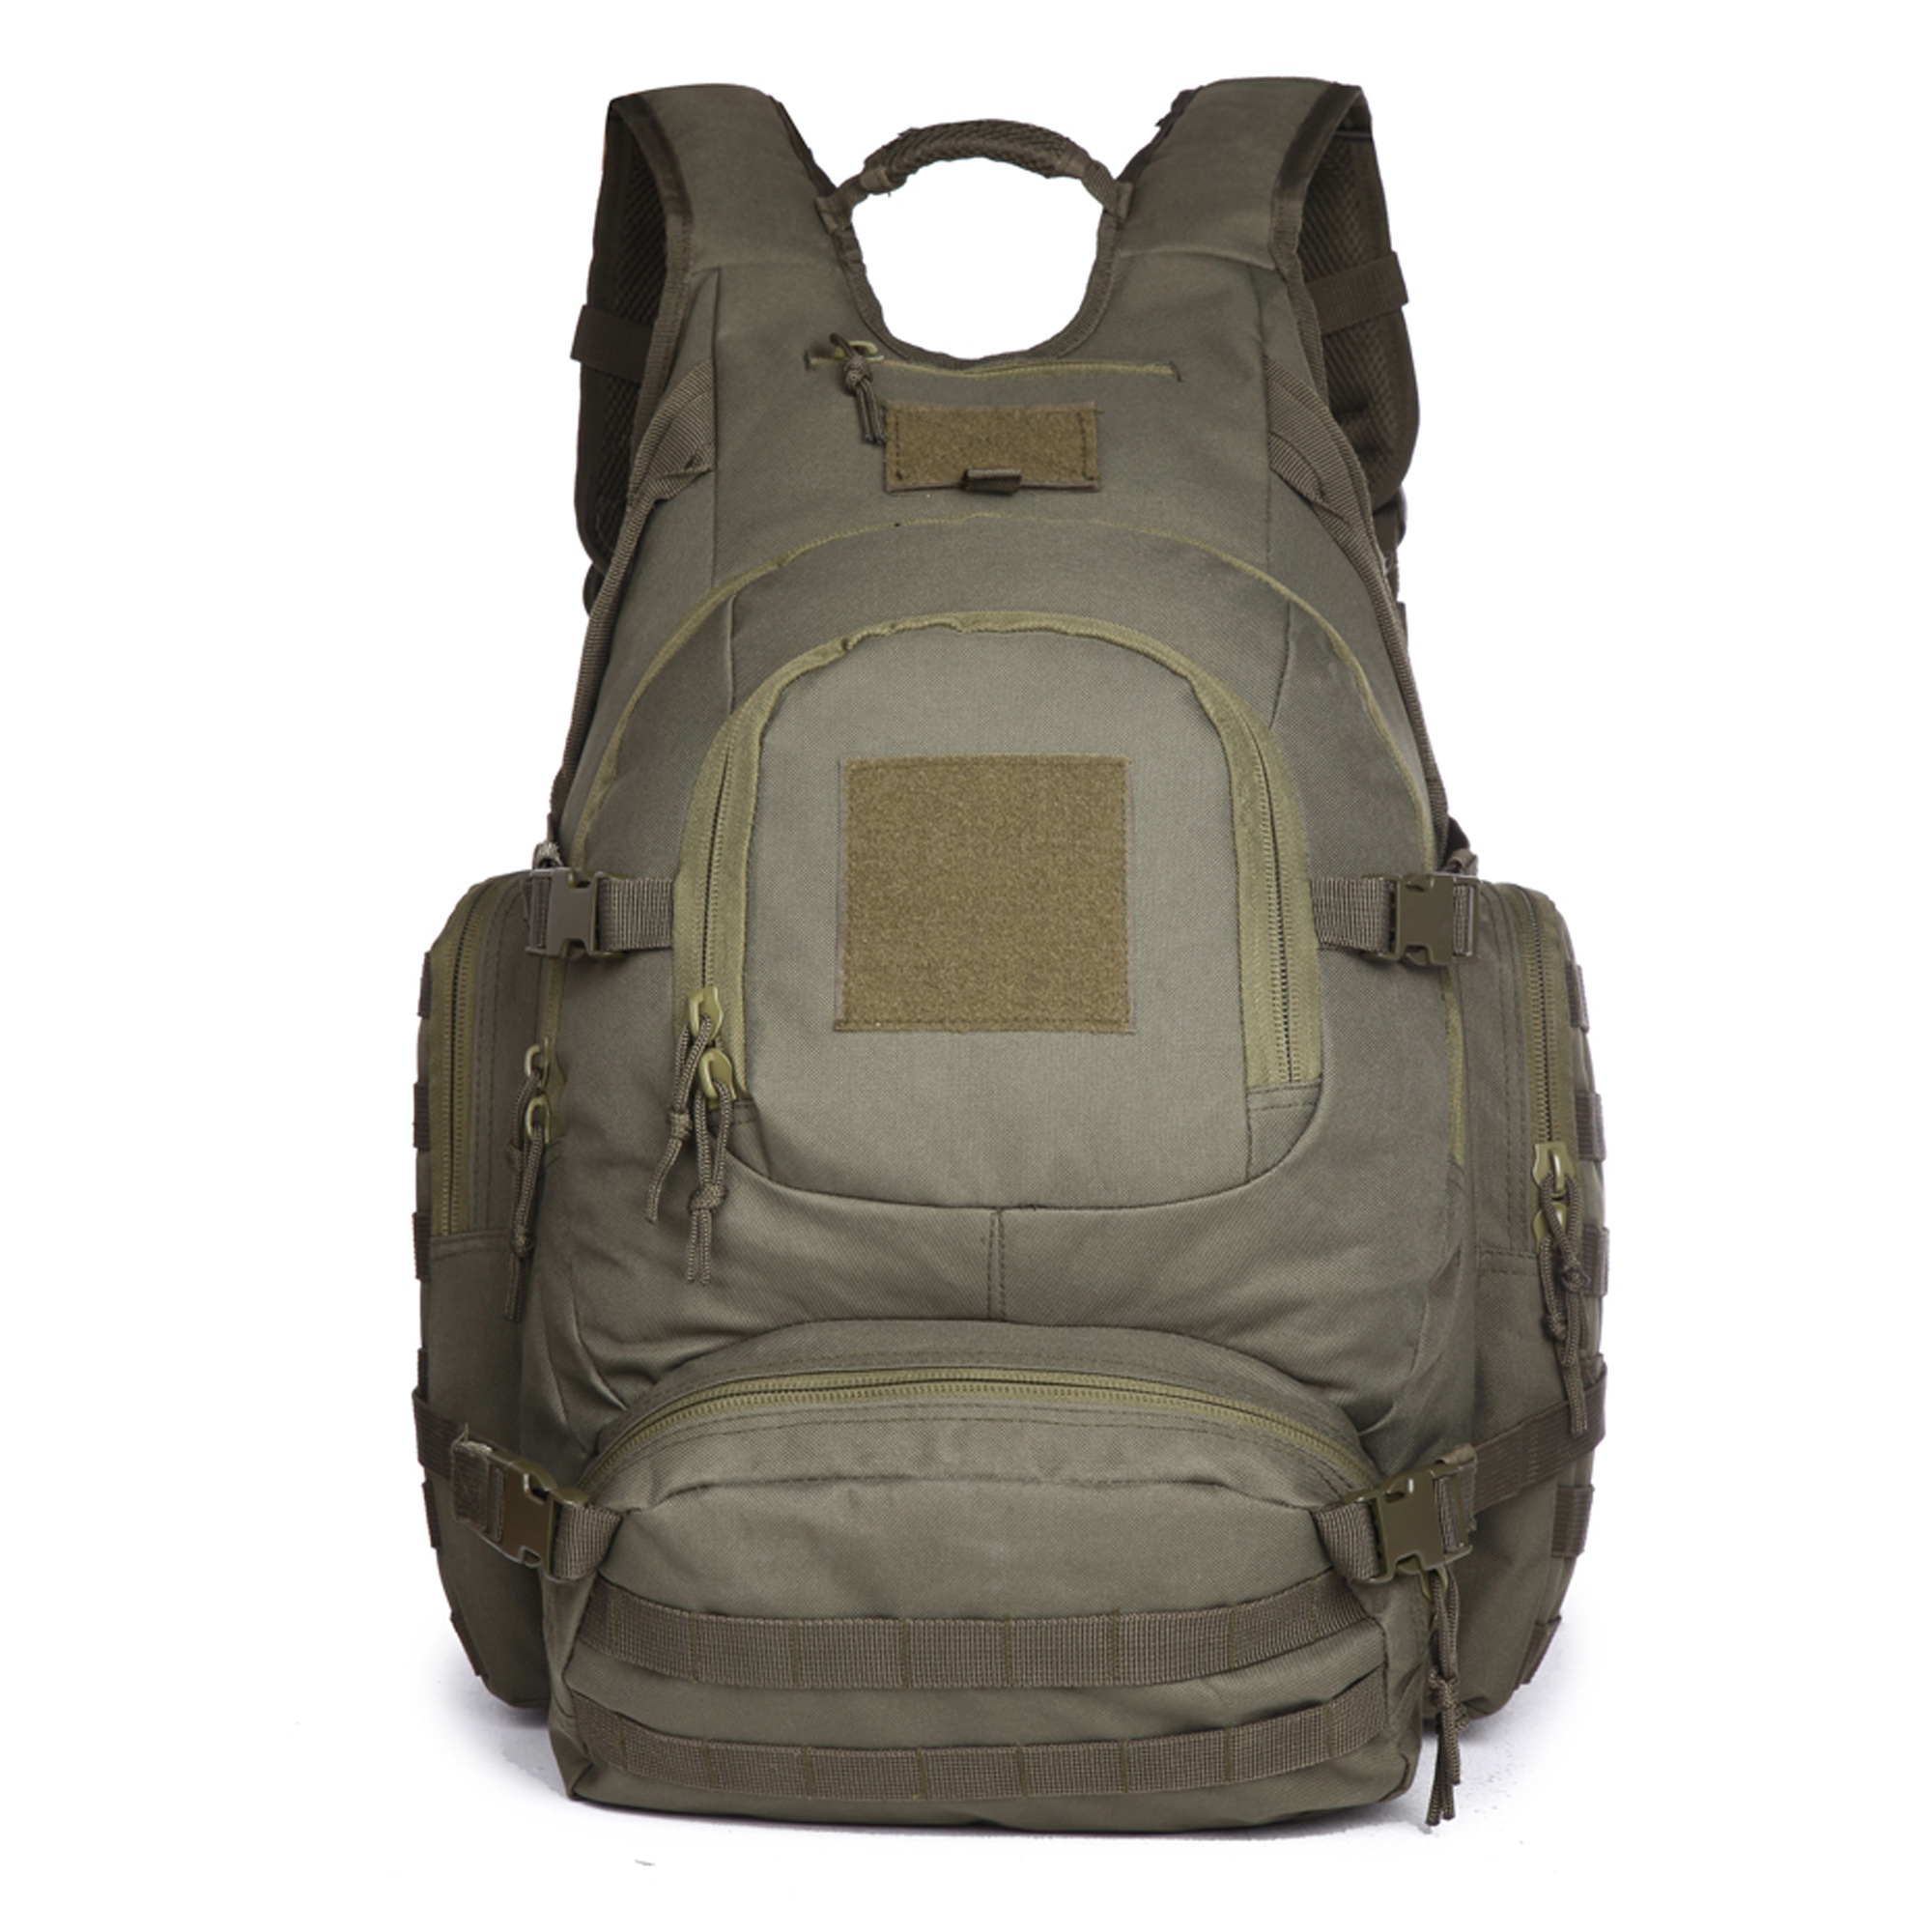 40L Sport Military Rucksacks Tactical Molle Backpack Camping Hiking Trekking Hot